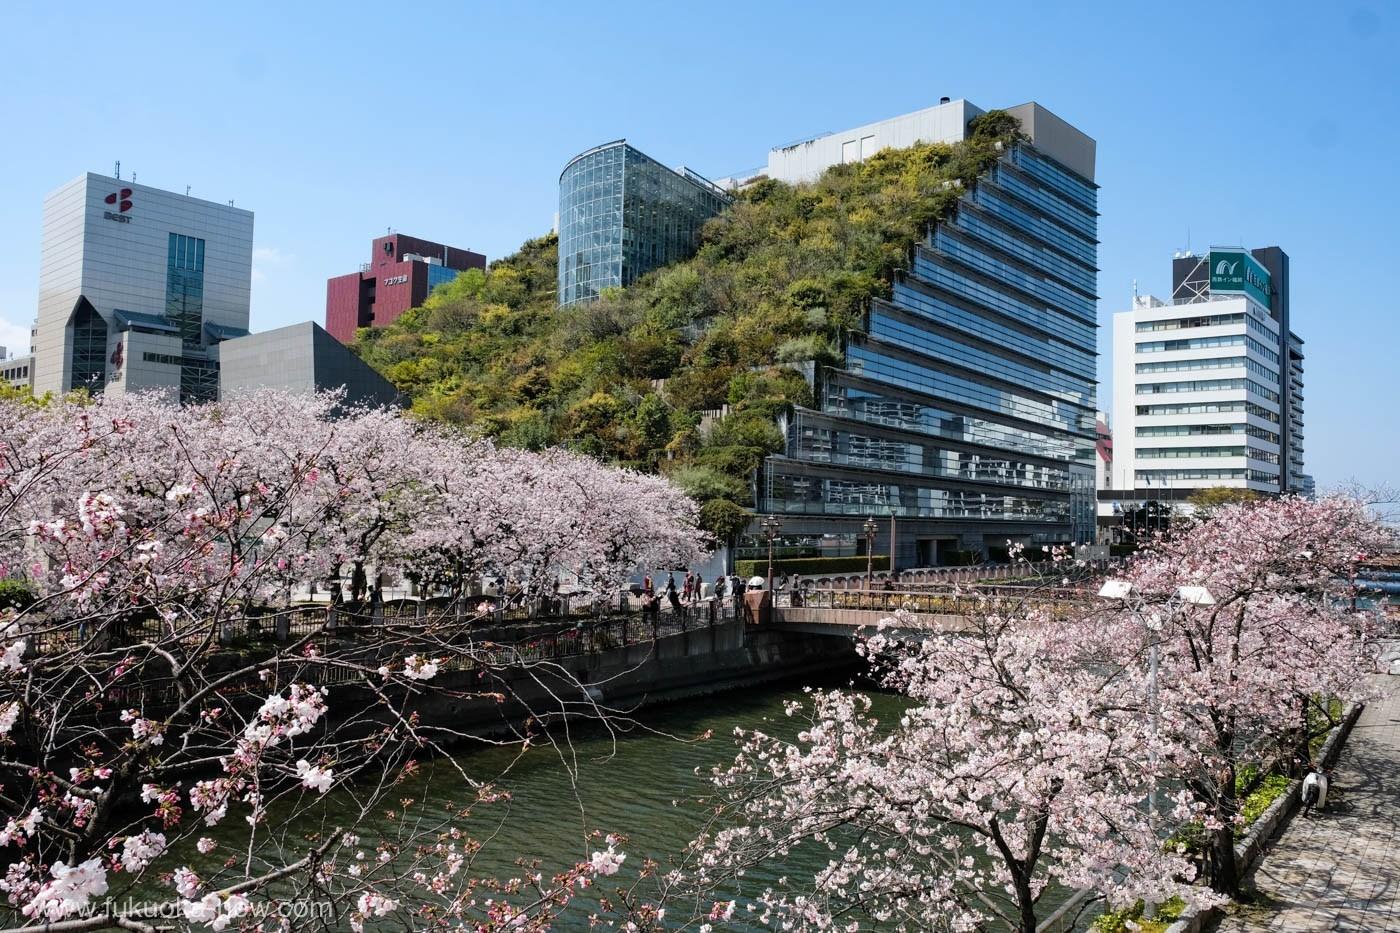 8D7N. Fukuoka.Economy. + Free & Easy **ALPHA MAGIC 20**